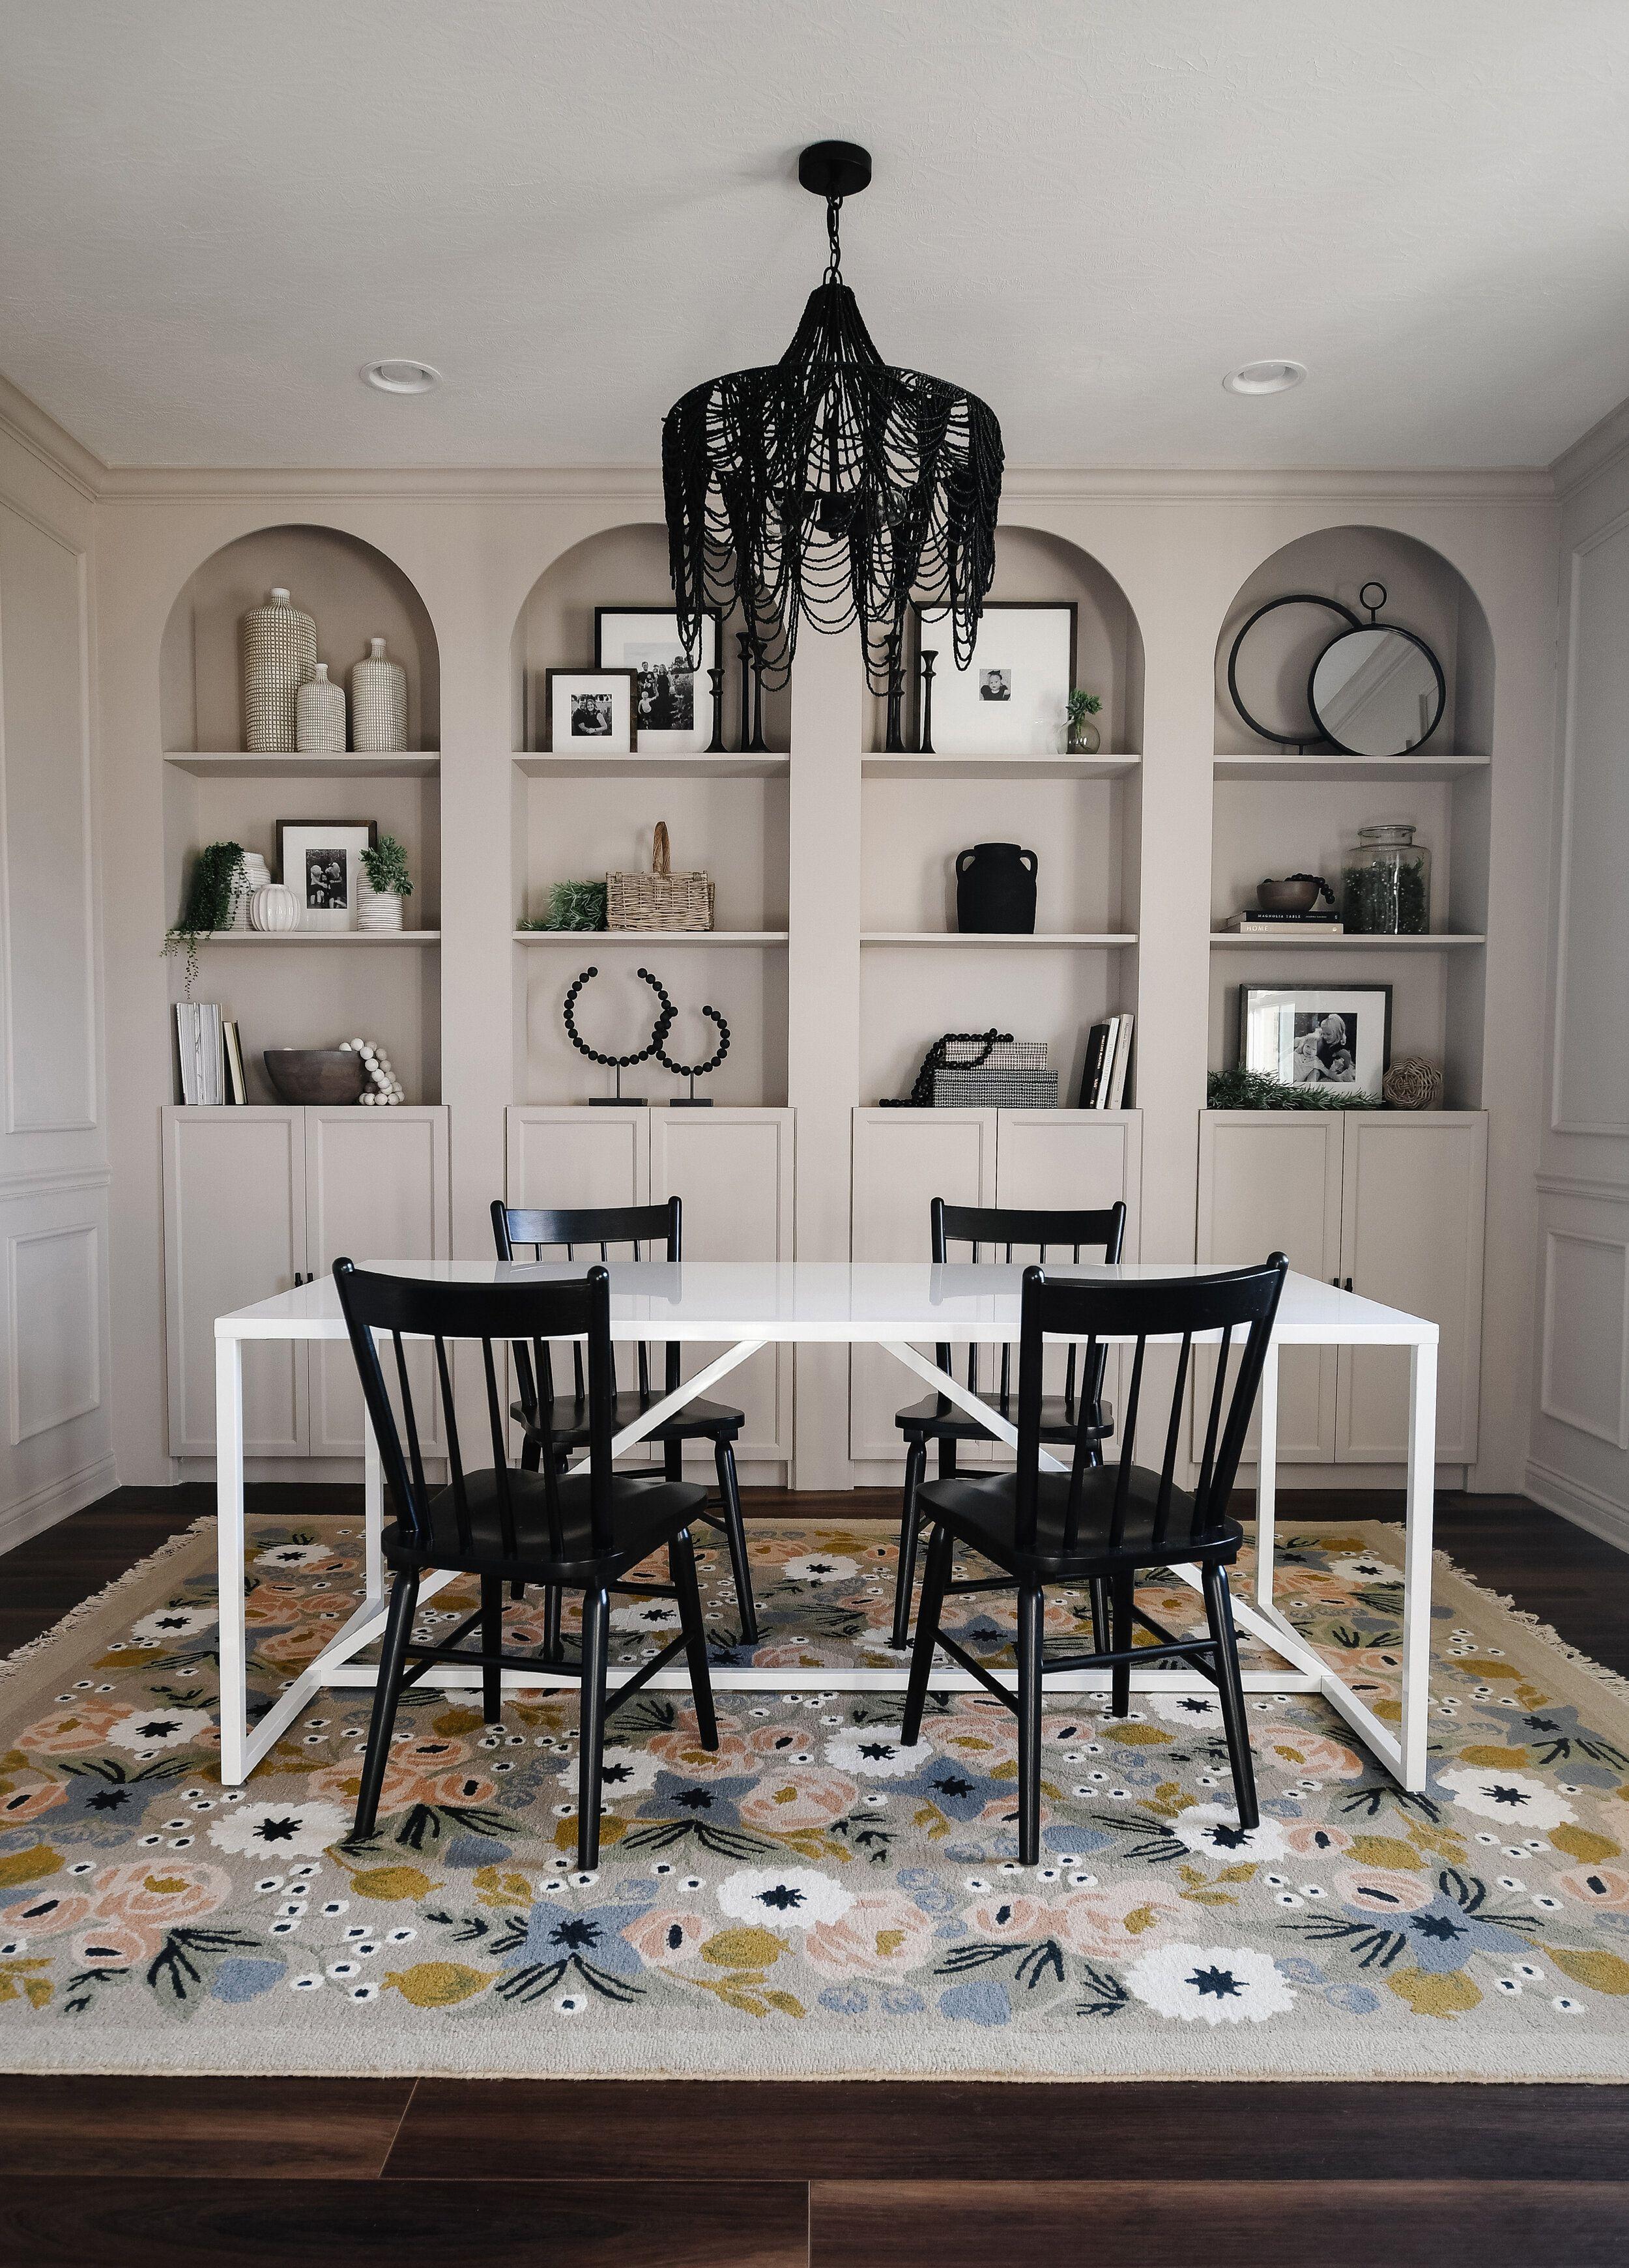 DIY Arched Bookshelves (IKEA Billy hack